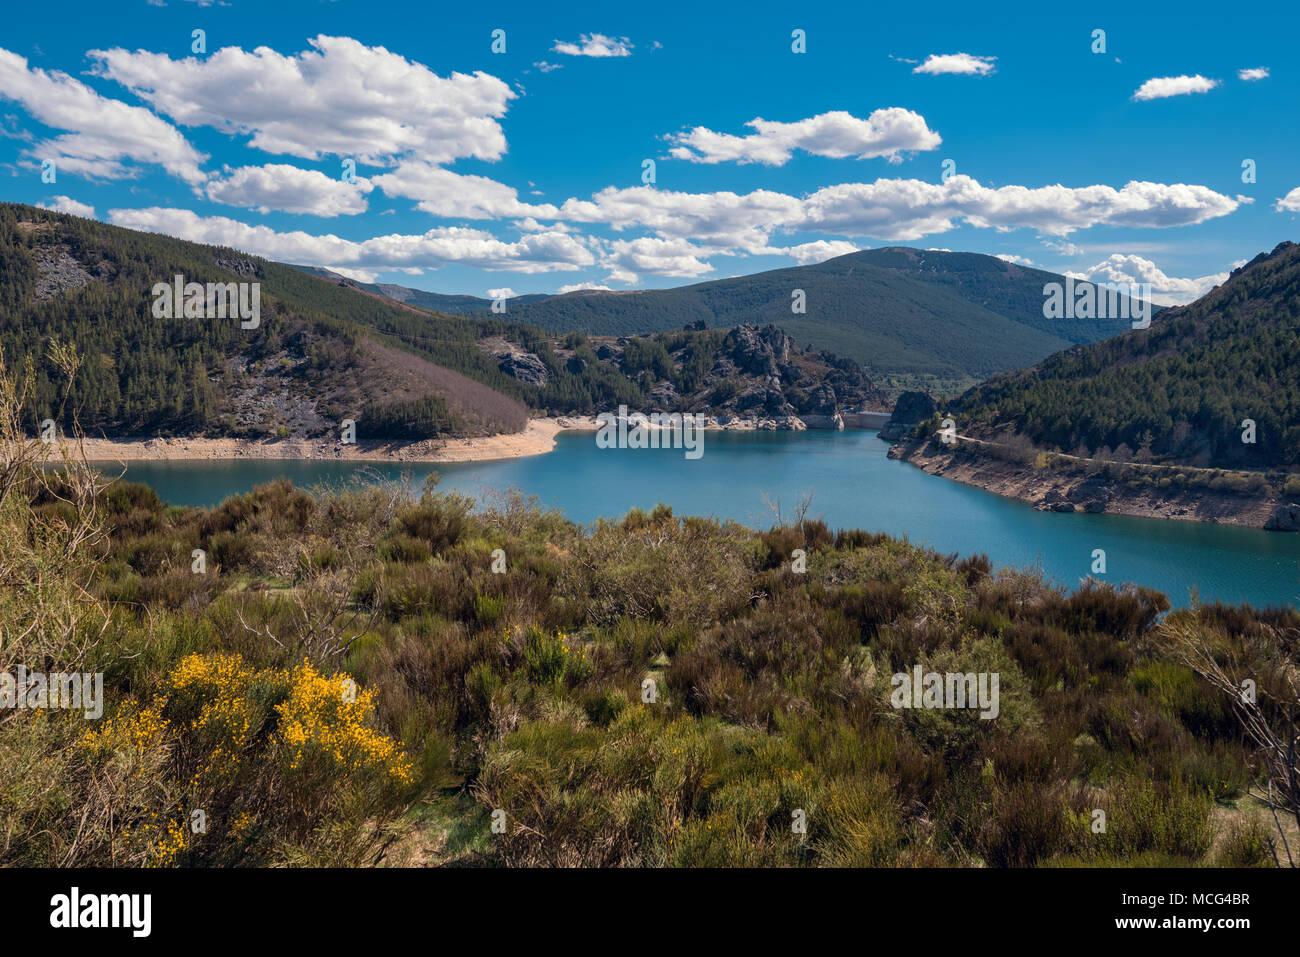 Scenic landscape of Lake camporredondo in Palencia, Castilla y León, Spain. - Stock Image